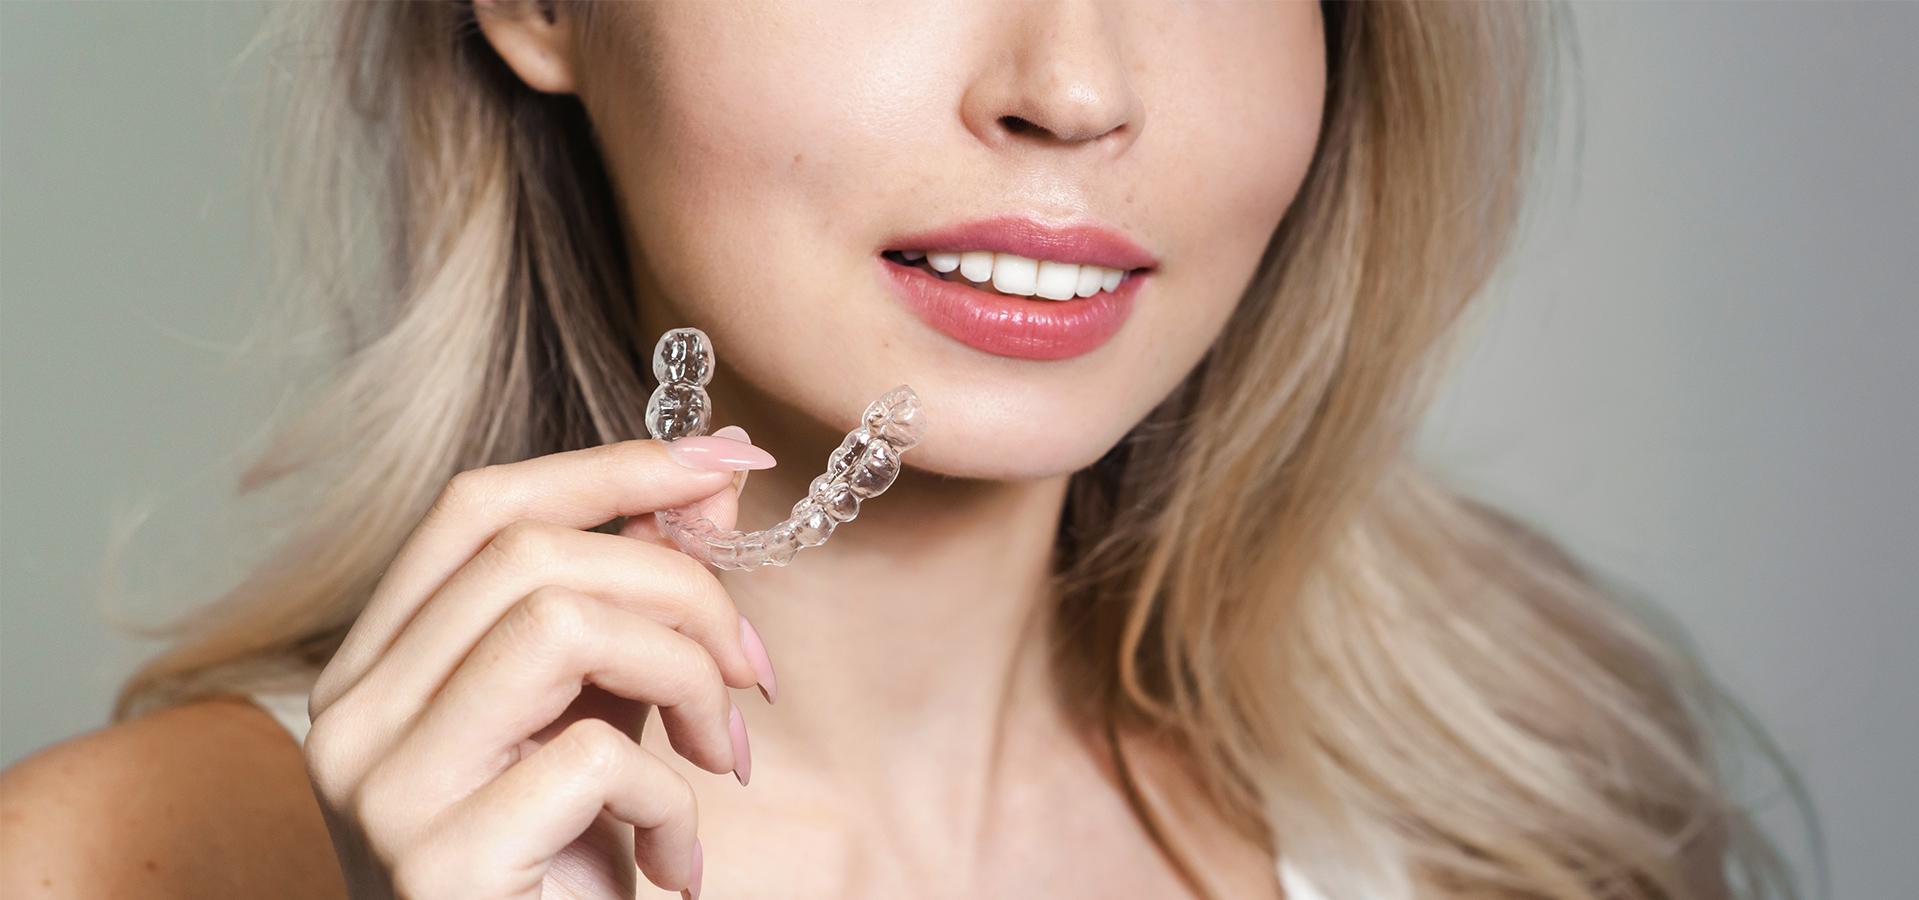 Invisalign – Orthodontics